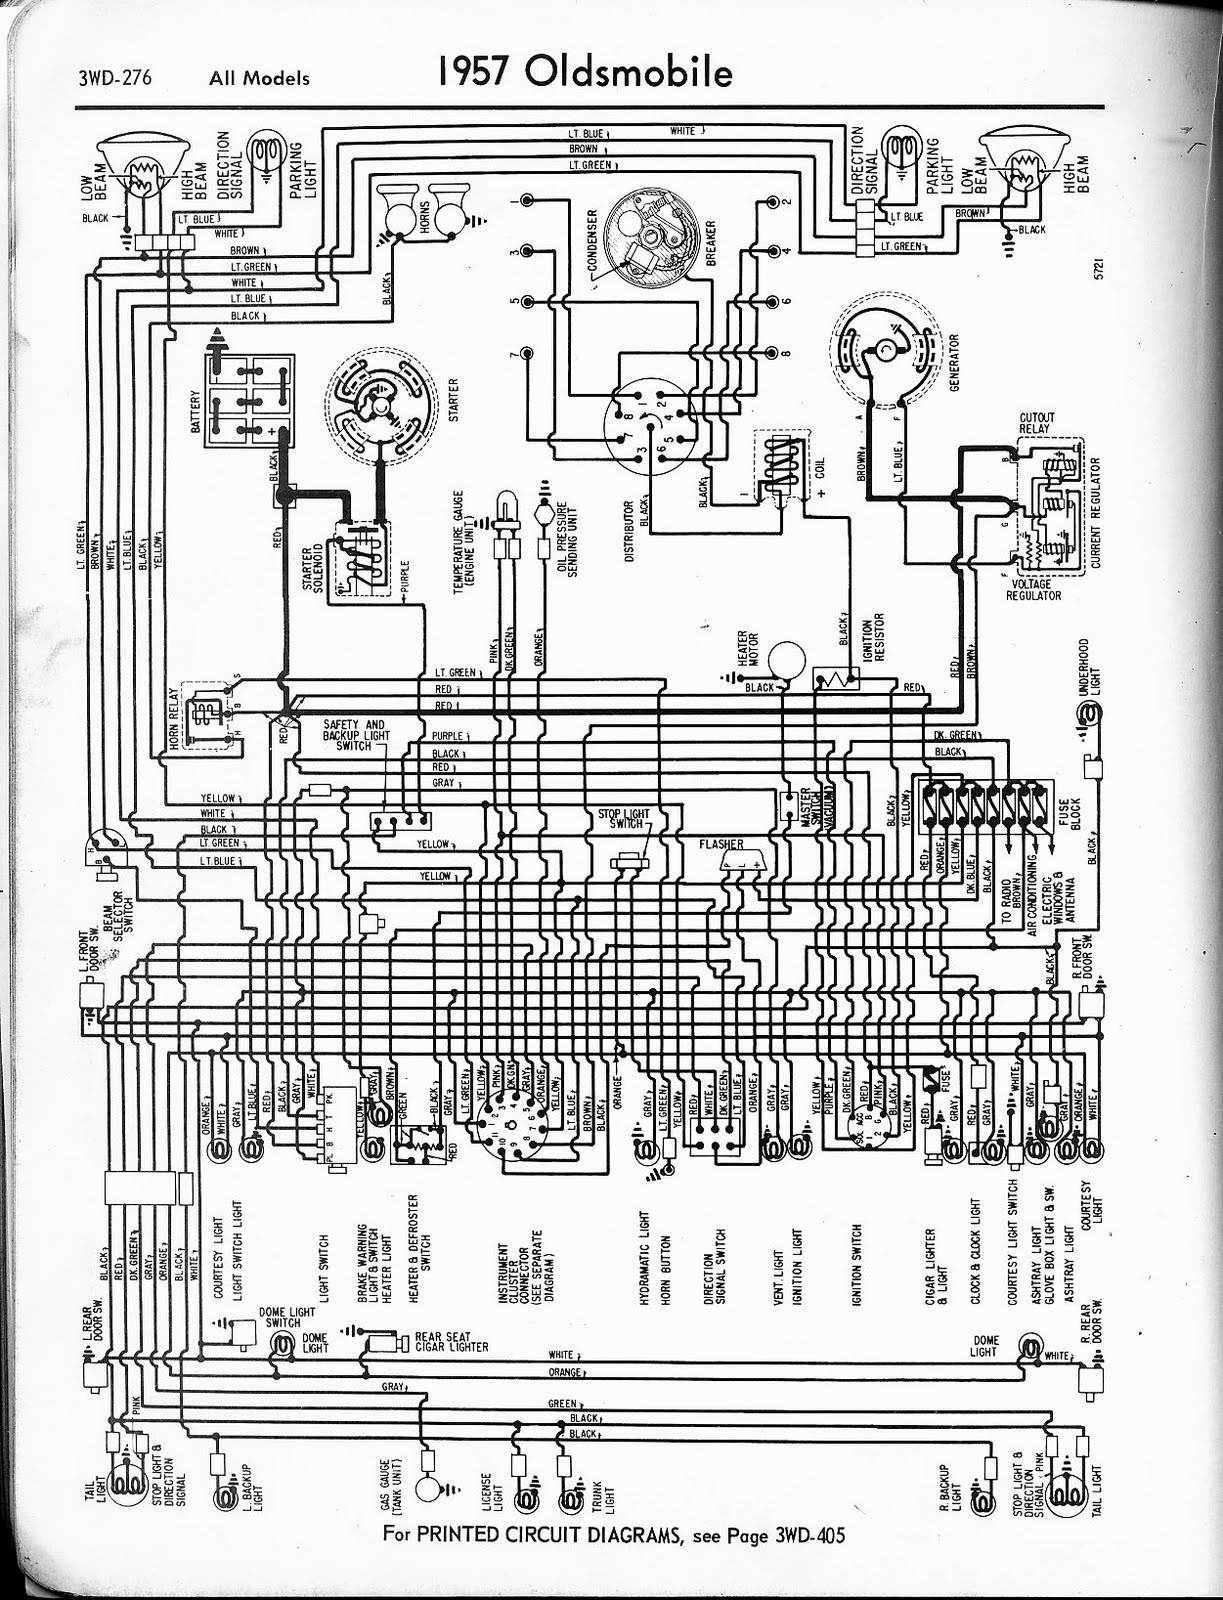 Free Auto Wiring Diagram: 1957 Oldsmobile Wiring Diagram